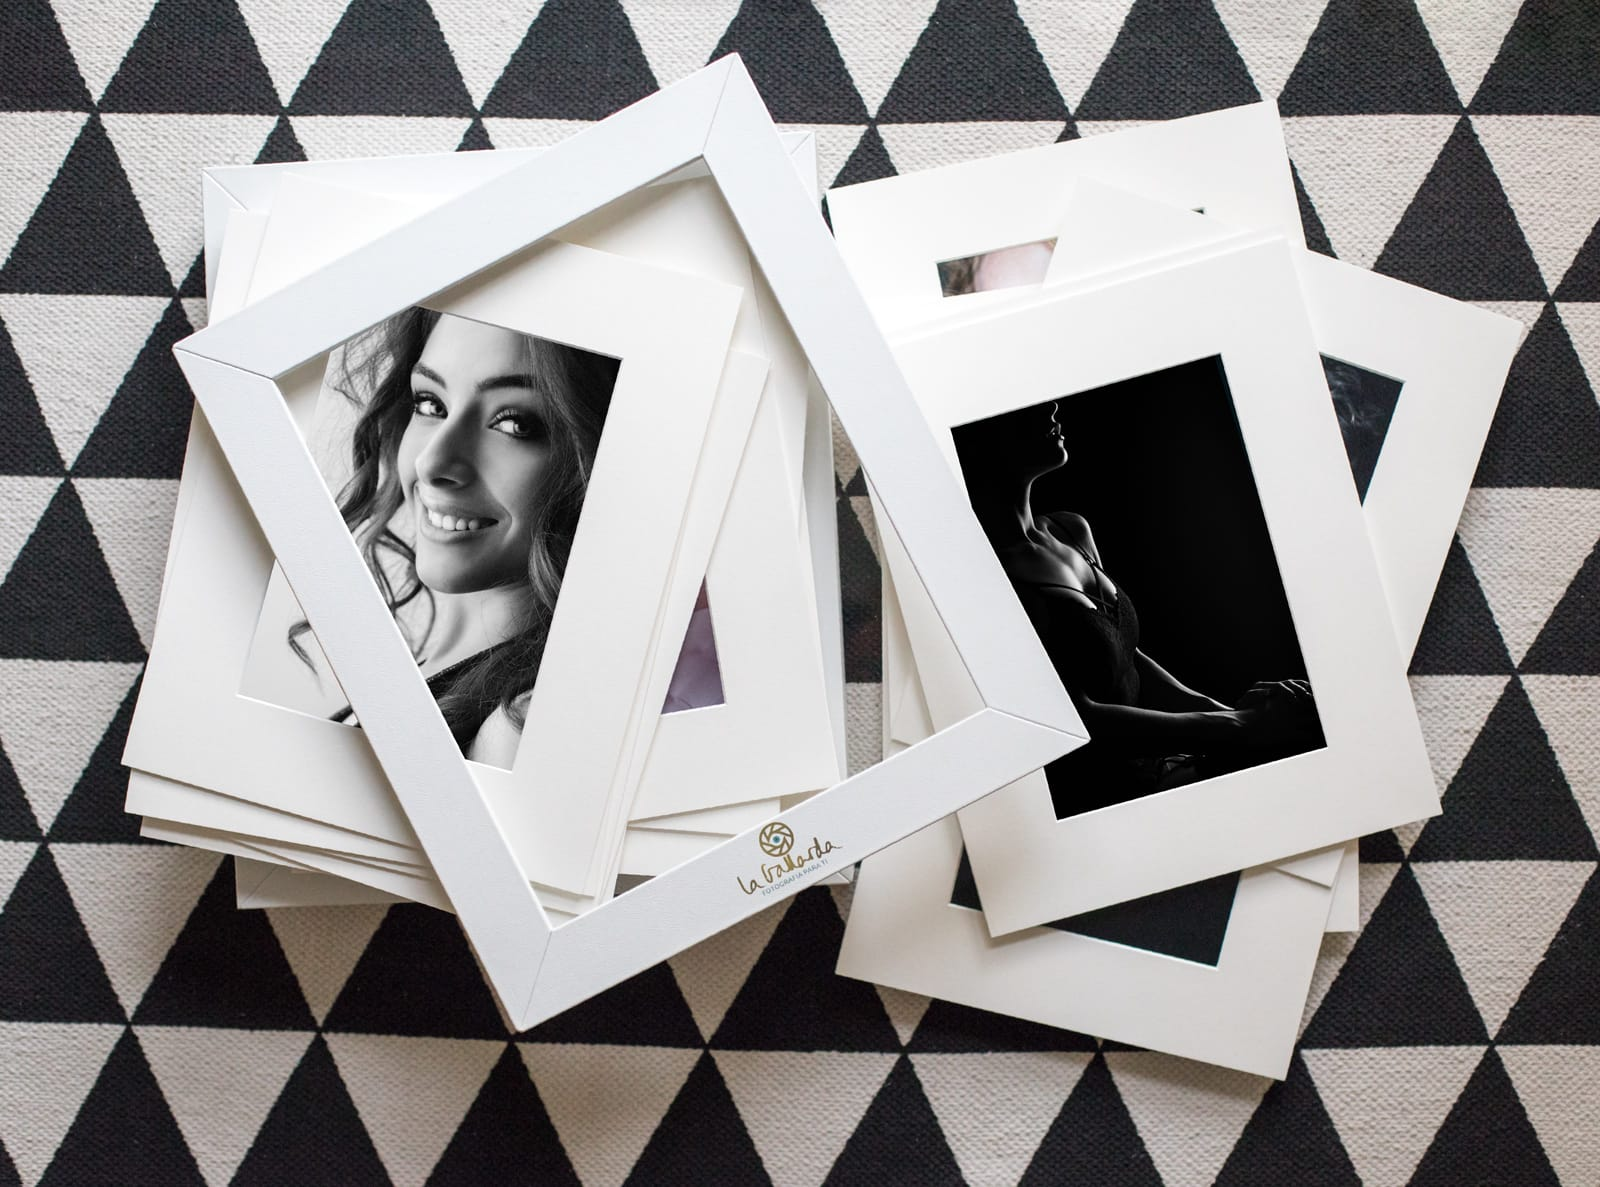 Tus fotografías Producto Nuestro Photobox La Gallarda Fotografia Profesional mejor estudio fotografico Malaga Alhaurin Marbella fotógrafo recomendado photographer fotografas retrato boudoir moda bebe familia espacios